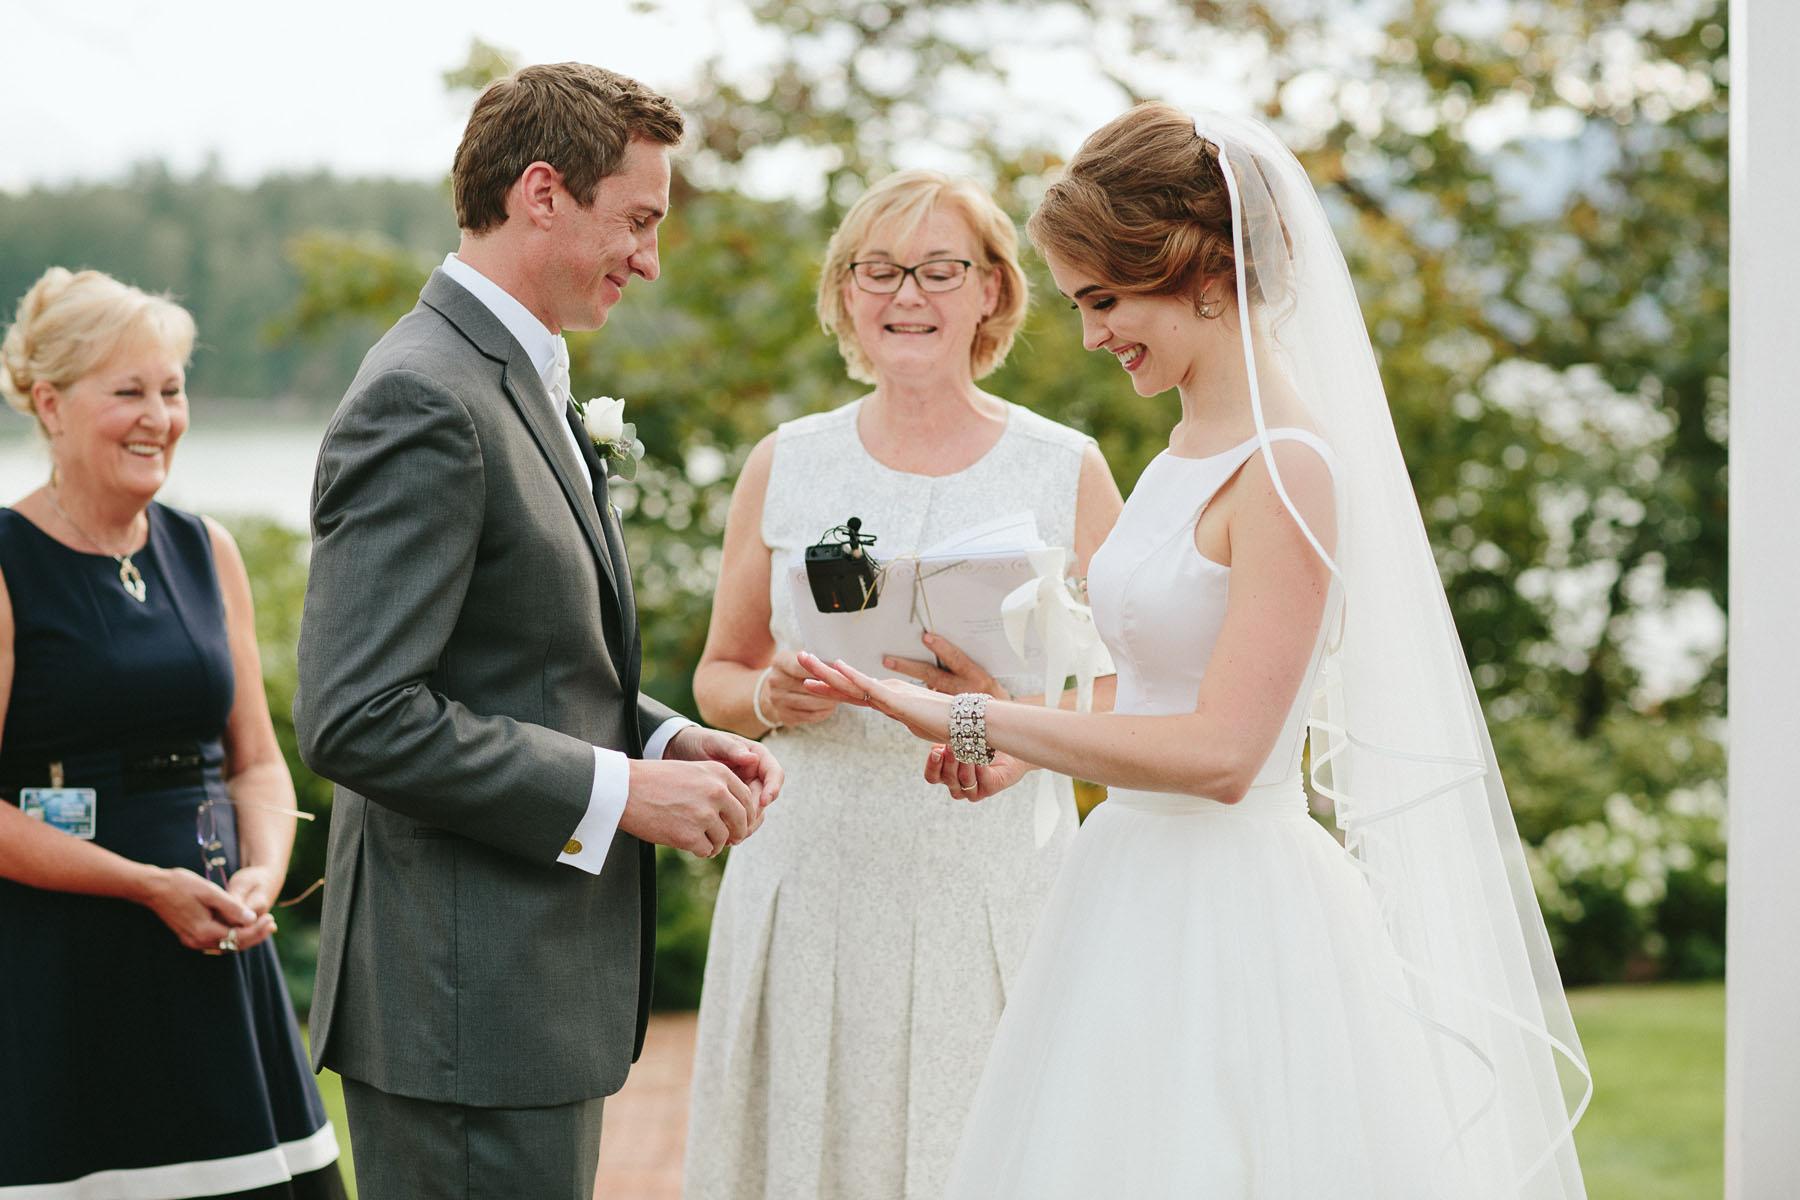 thetis-island-wedding-photographer-rp-rn-093.jpg